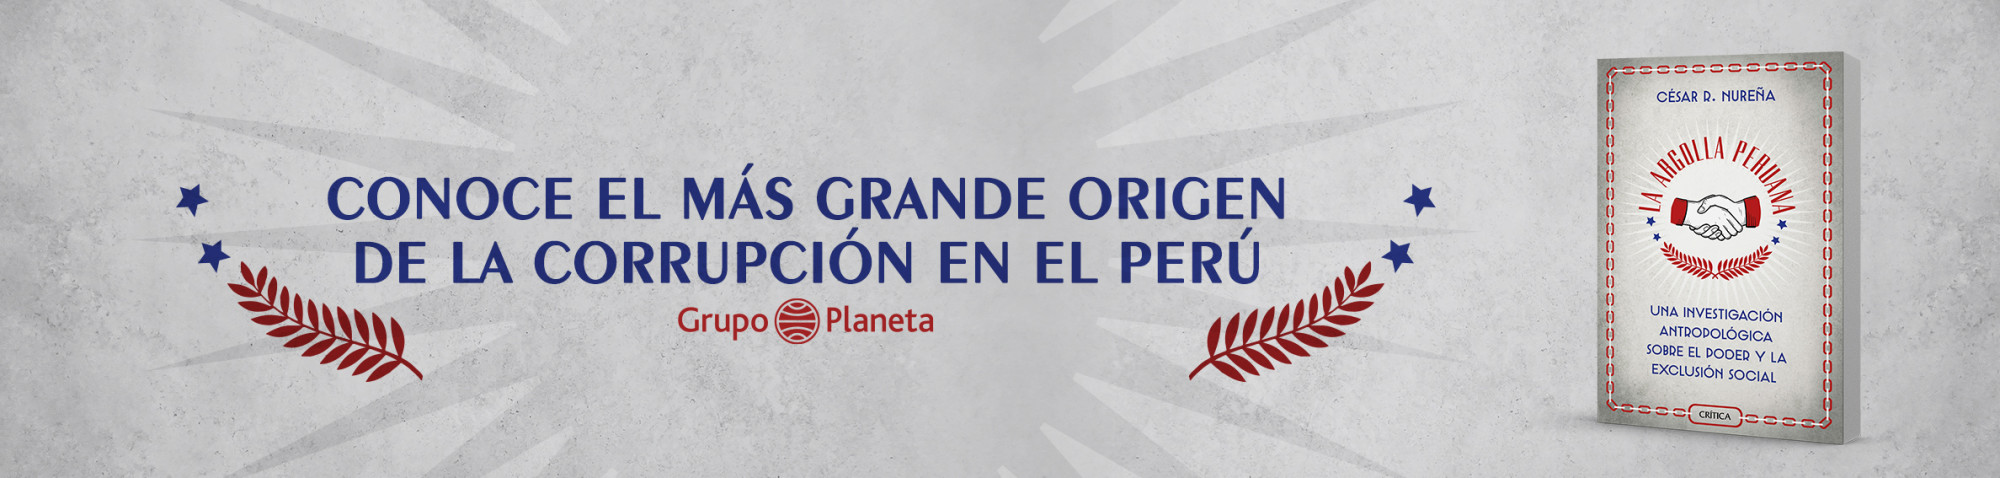 1264_1_WEB-LA-ARGOLLA-PERUANA.jpg